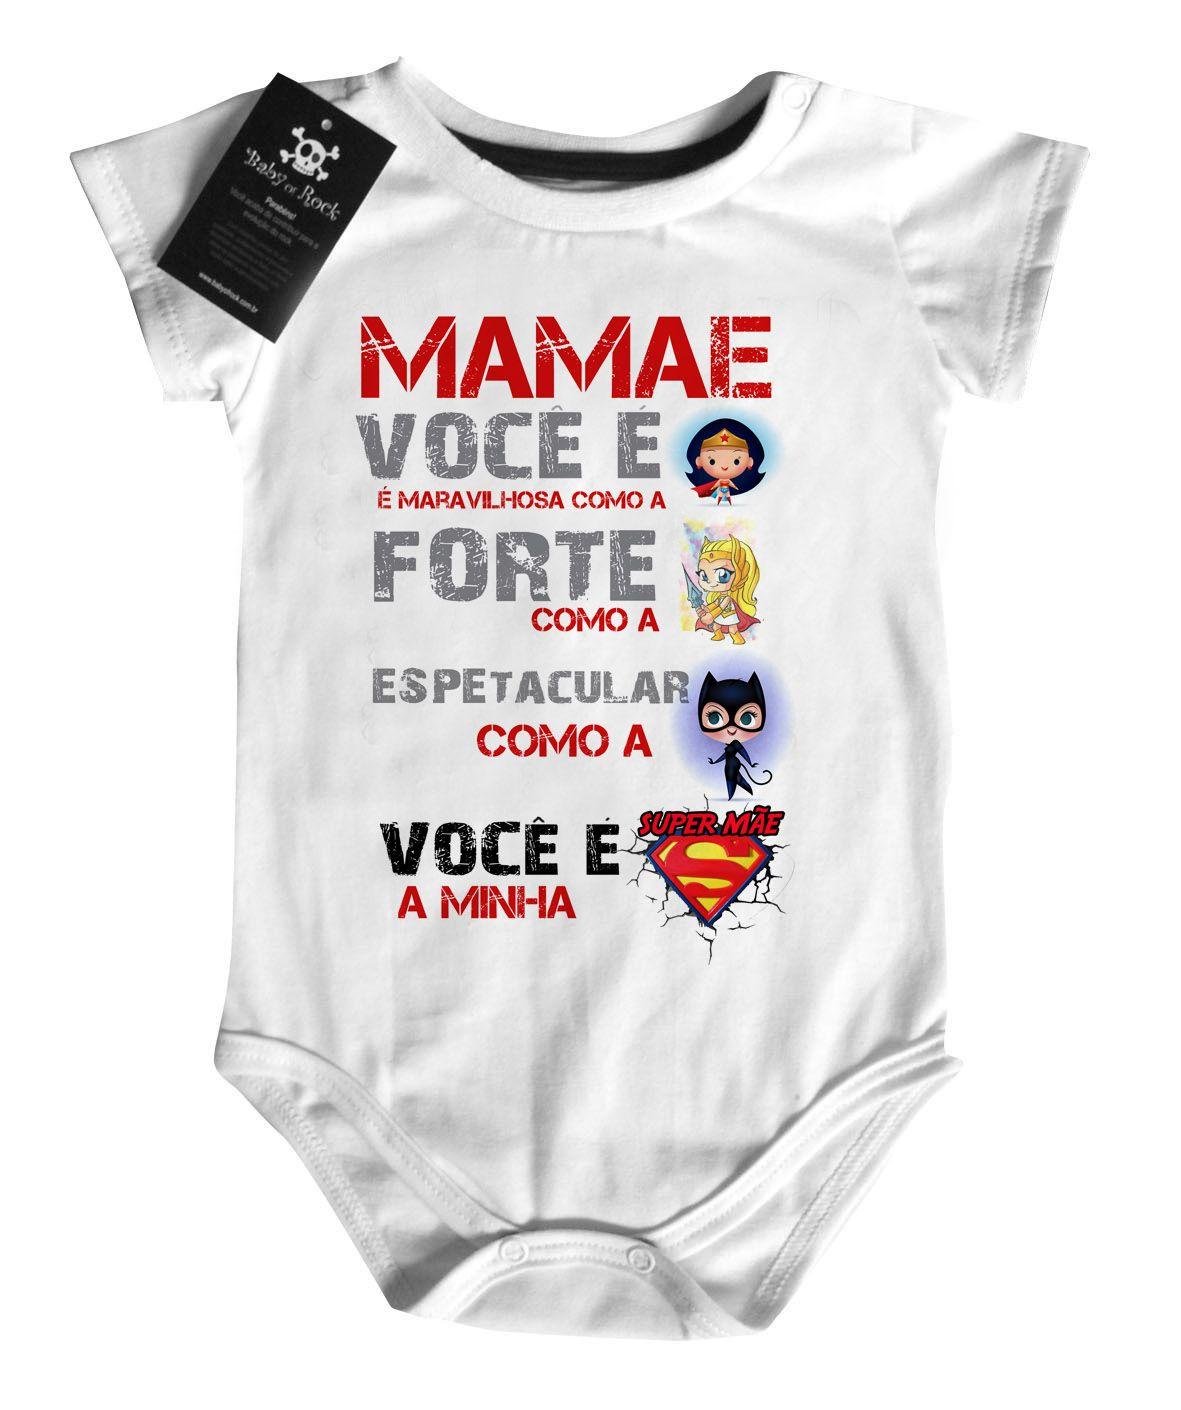 Body Rock Super Mãe Maravilha  - White  - Baby Monster S/A